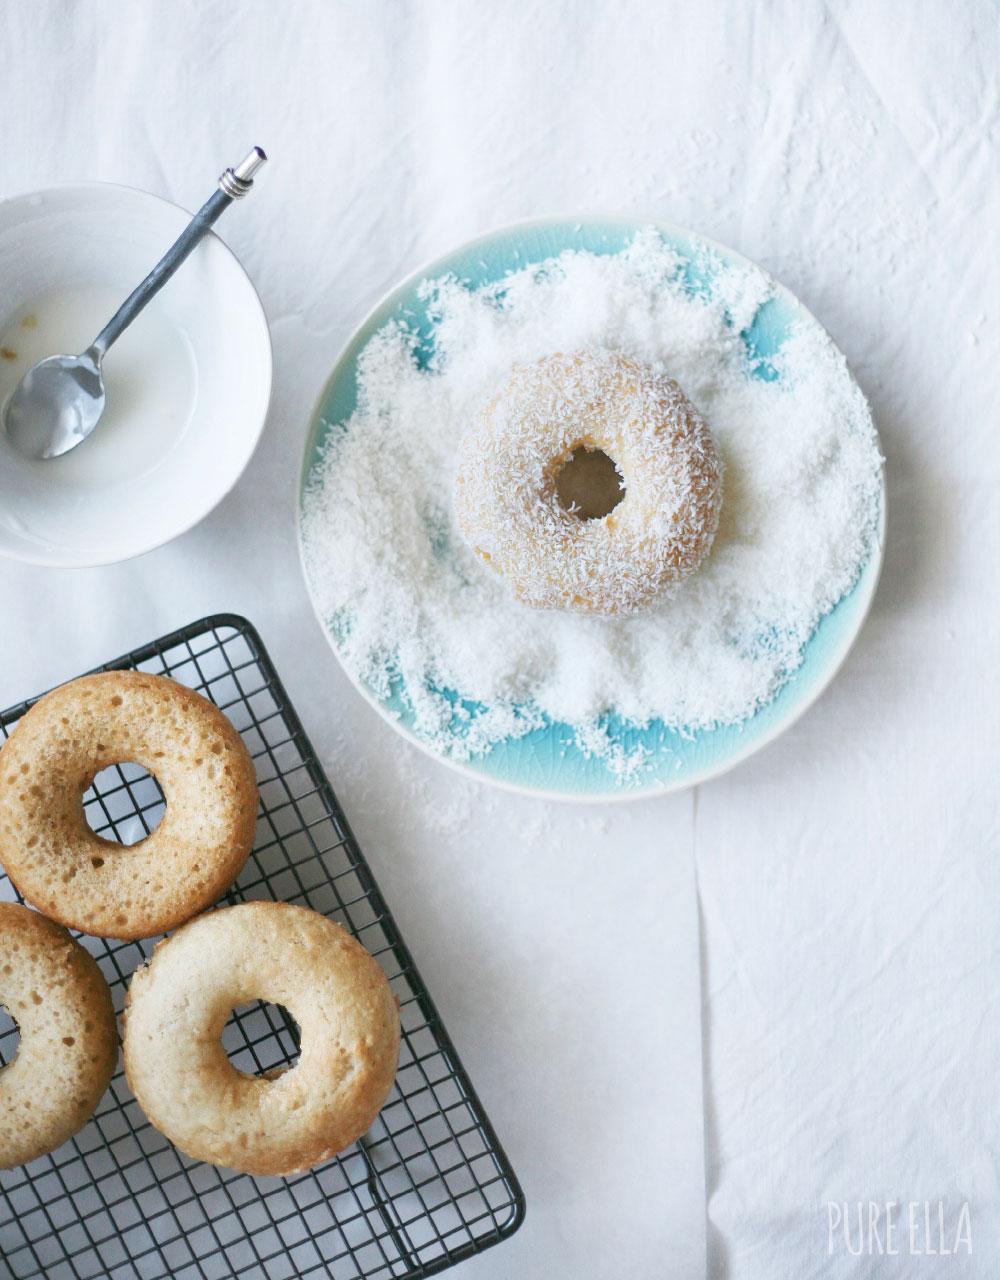 Pure-Ella-gluten-free-vegan-coconut-vanilla-donuts-so-delicious8